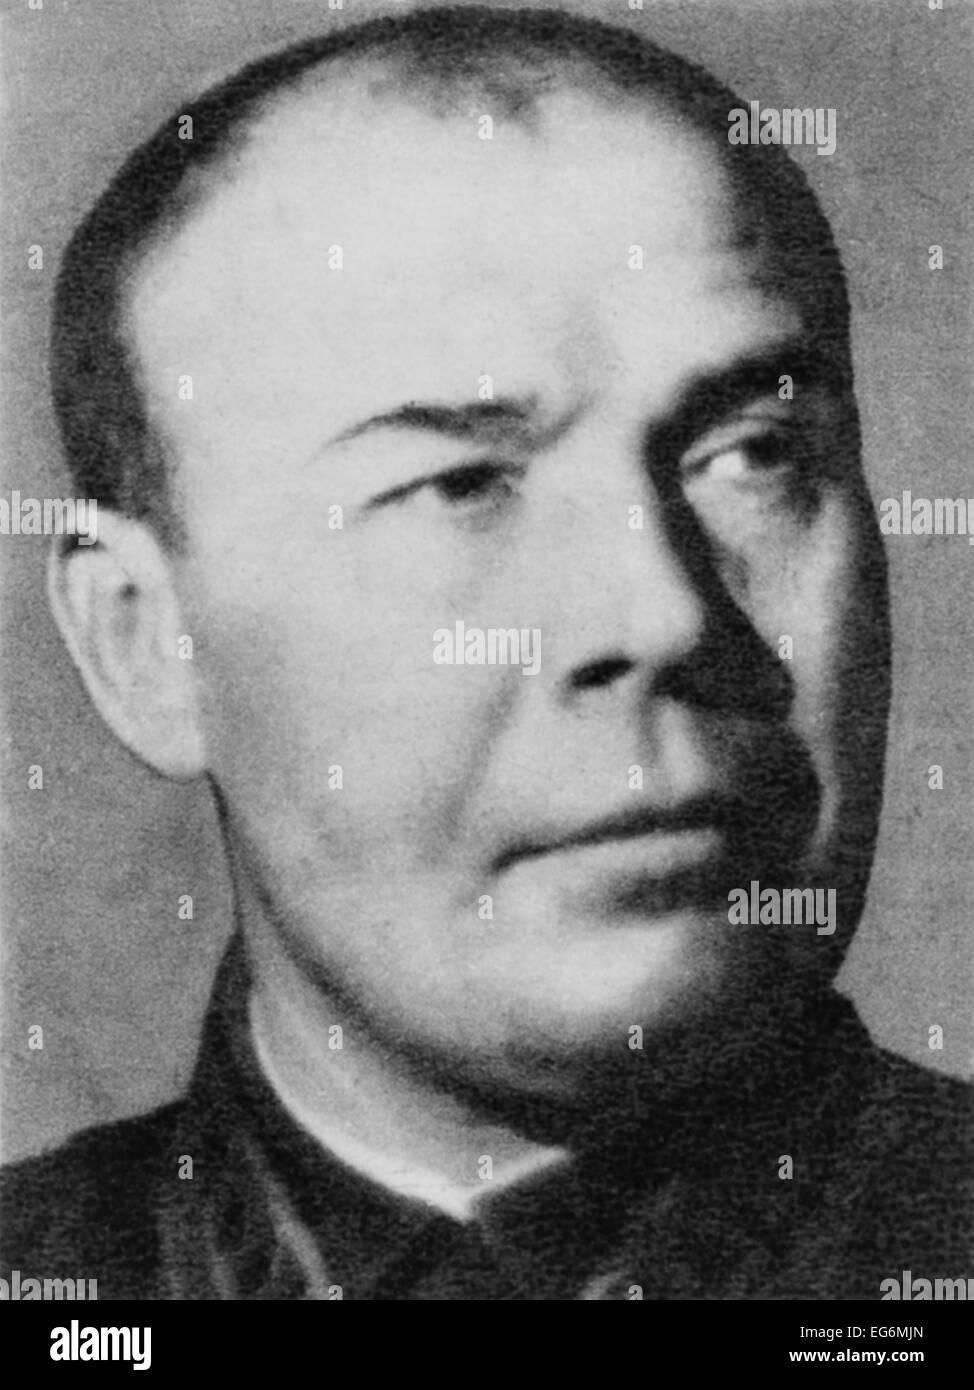 Soviet General Semyon Konstantinovich Timoshenko. Timoshenko lead Soviet armies in the Soviet-Finnish War and in - Stock Image